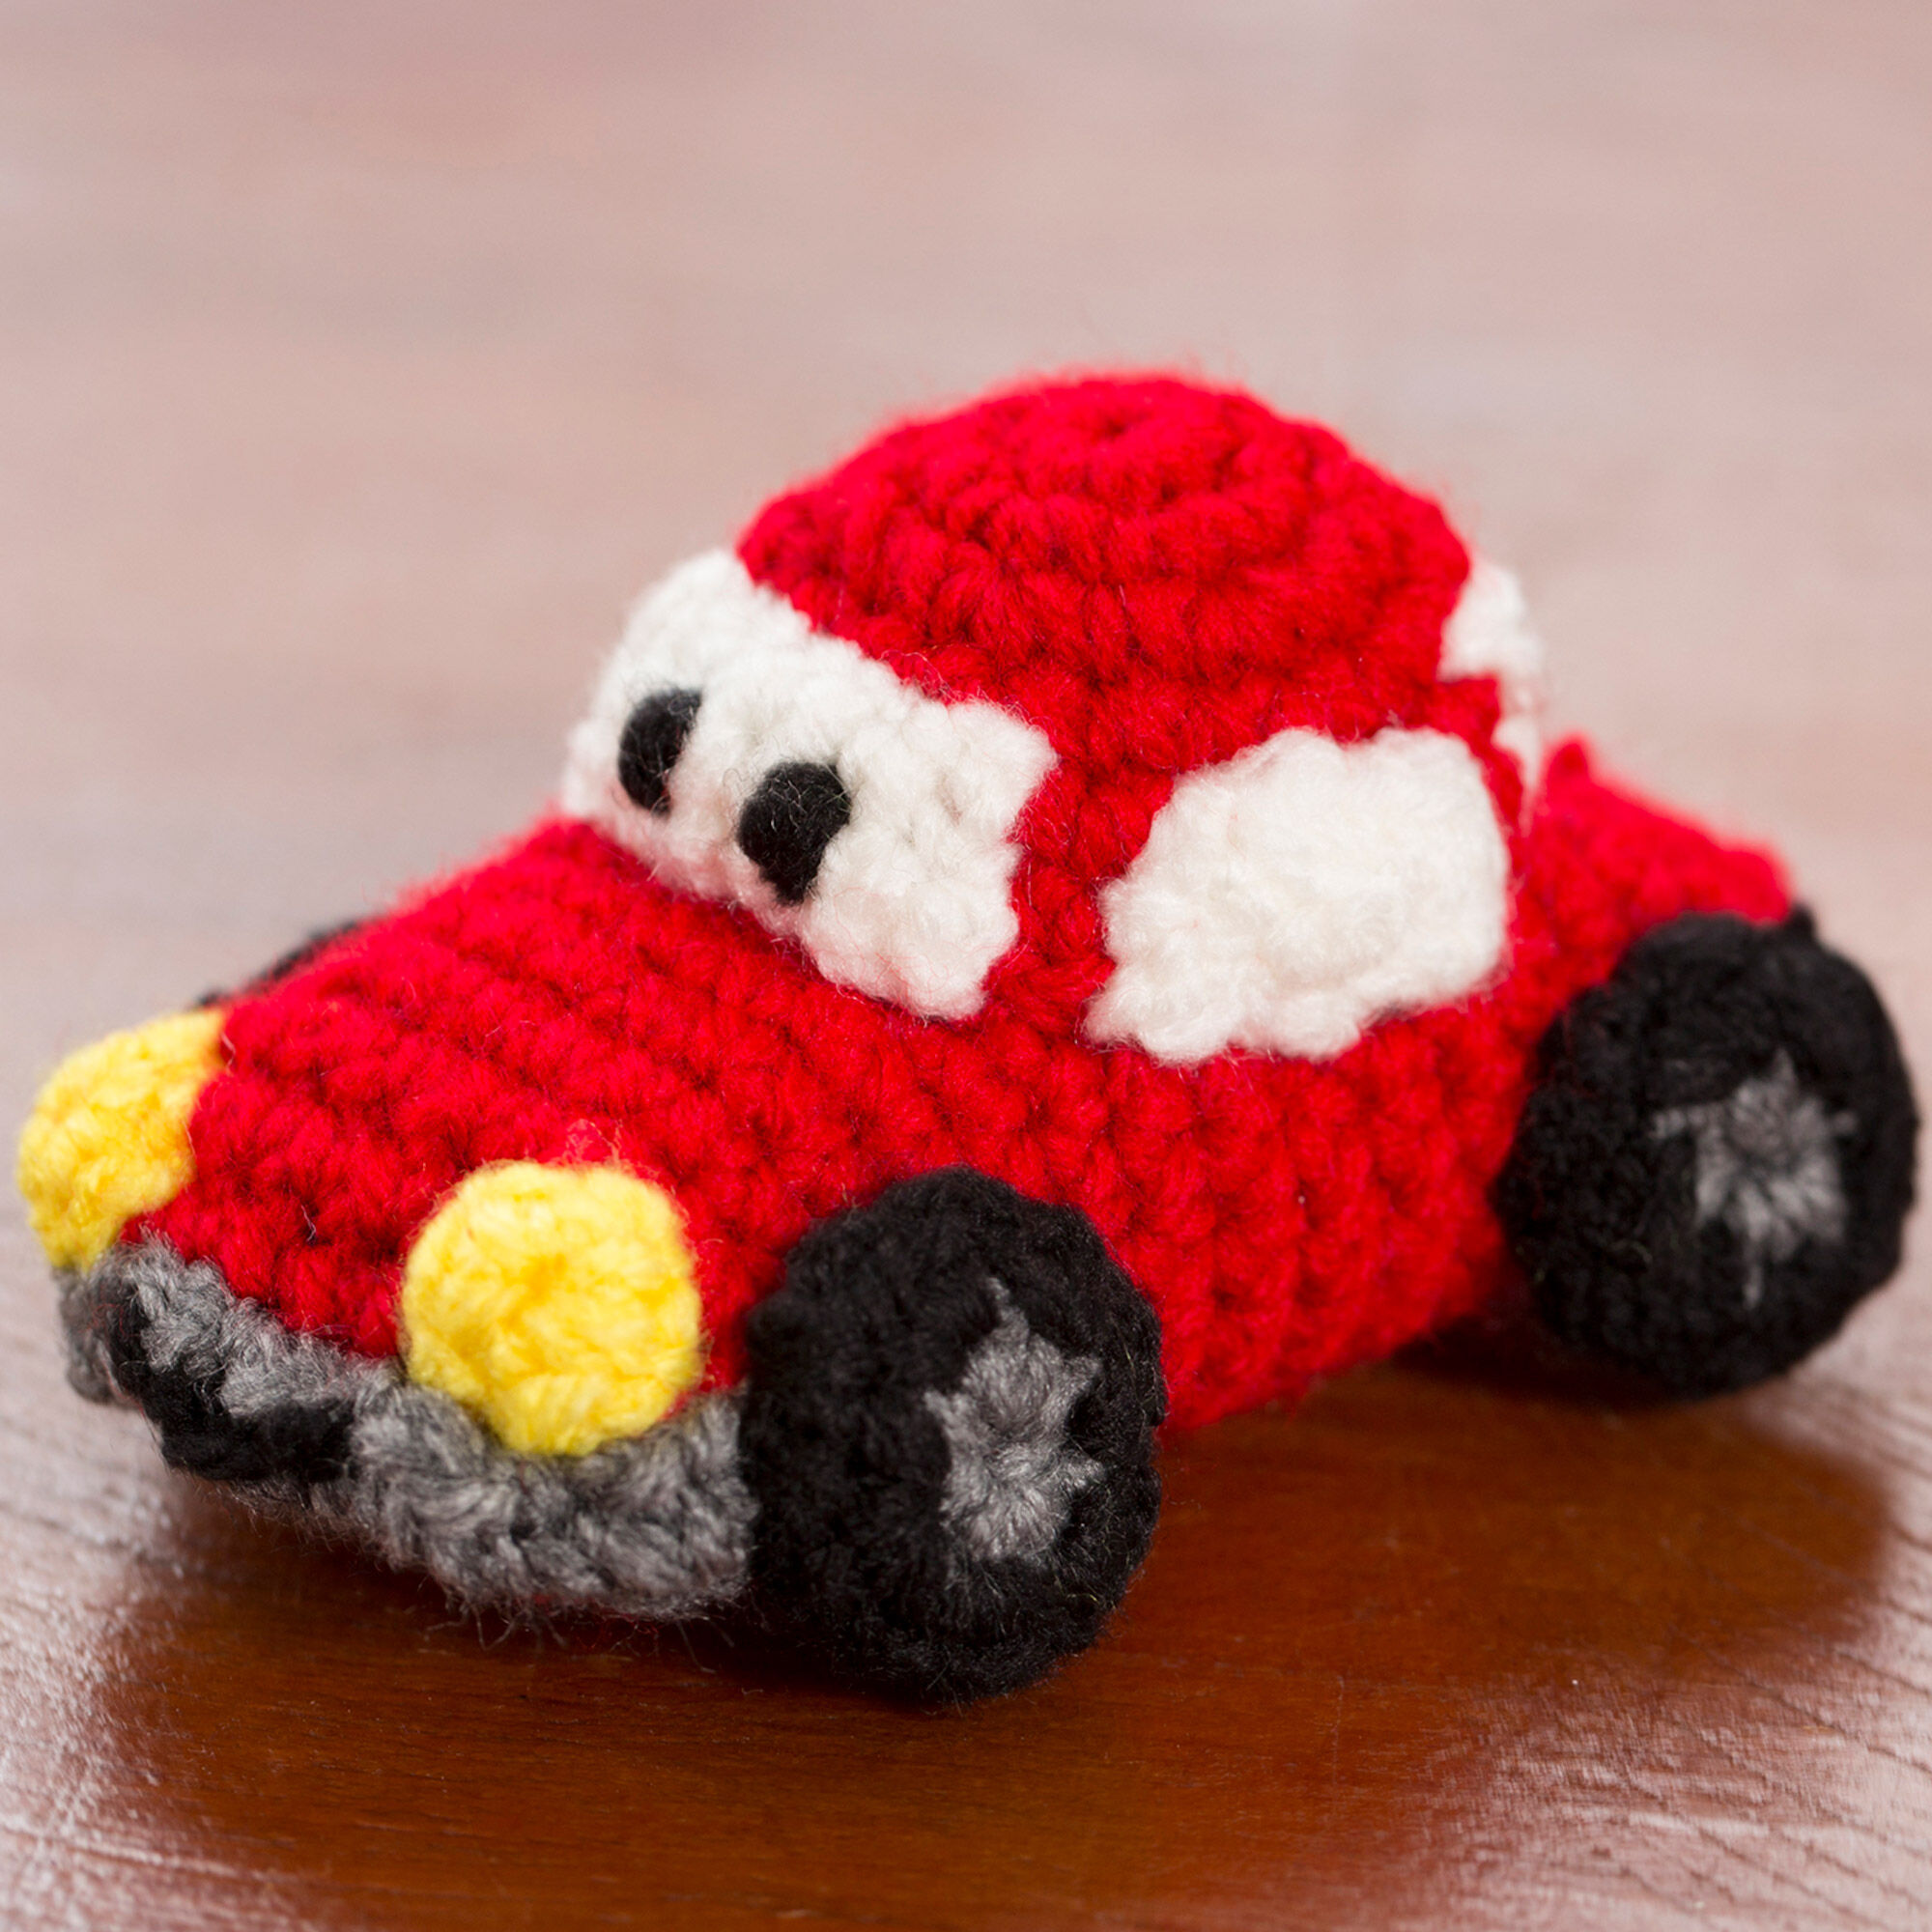 Amigurumi Crochet Car Free Patterns - Amigurumi Patterns Tutorials | 2000x2000